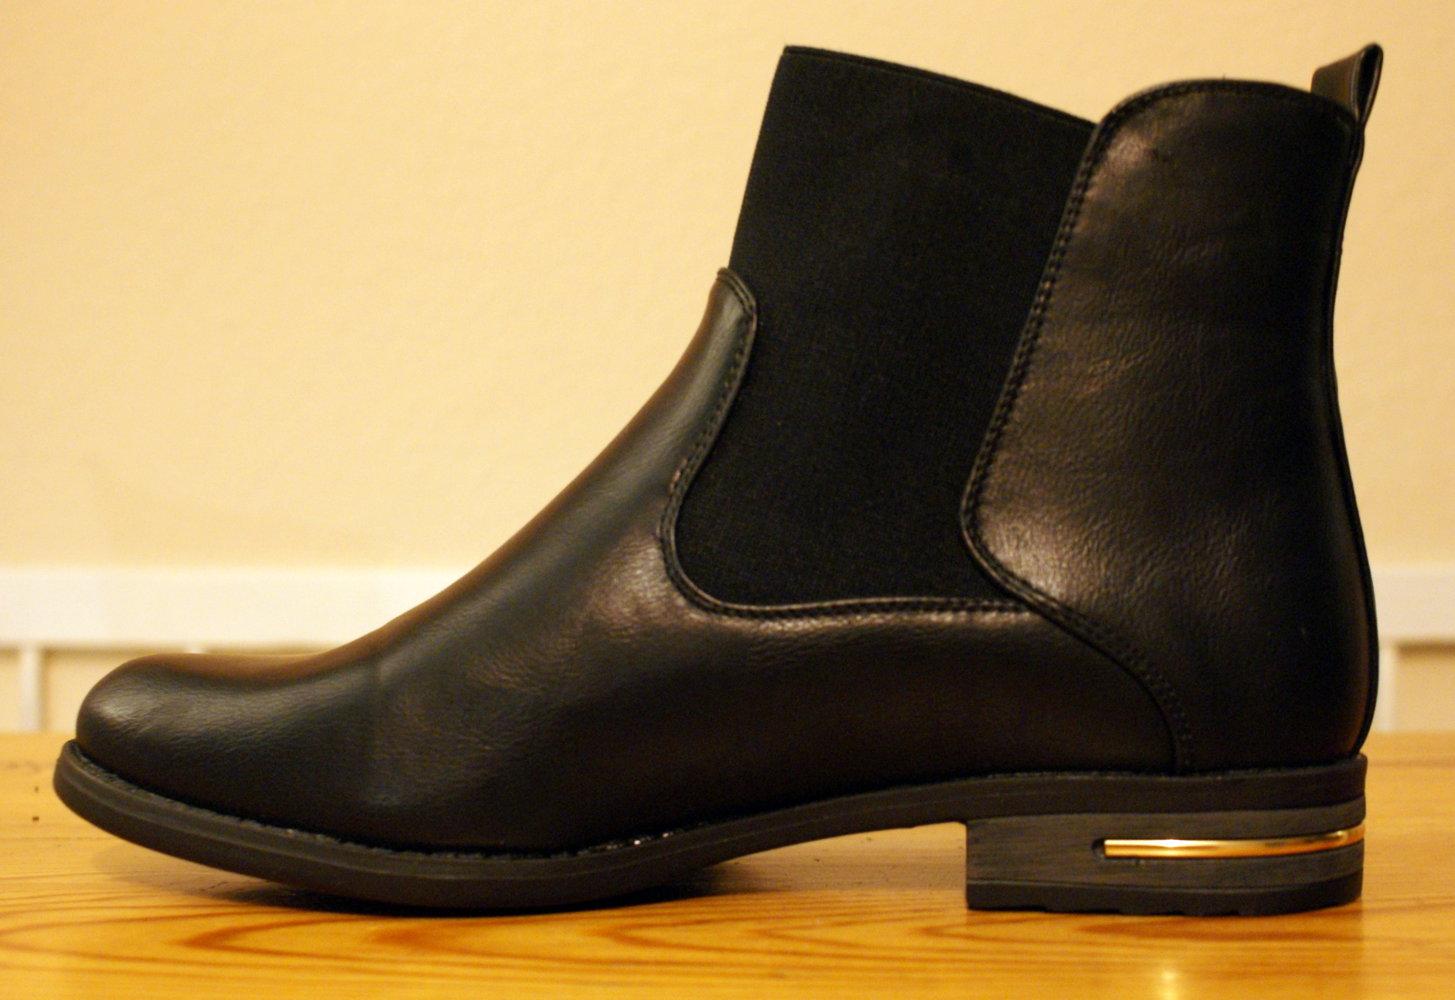 schwarze chelsea boots mit goldenen details. Black Bedroom Furniture Sets. Home Design Ideas